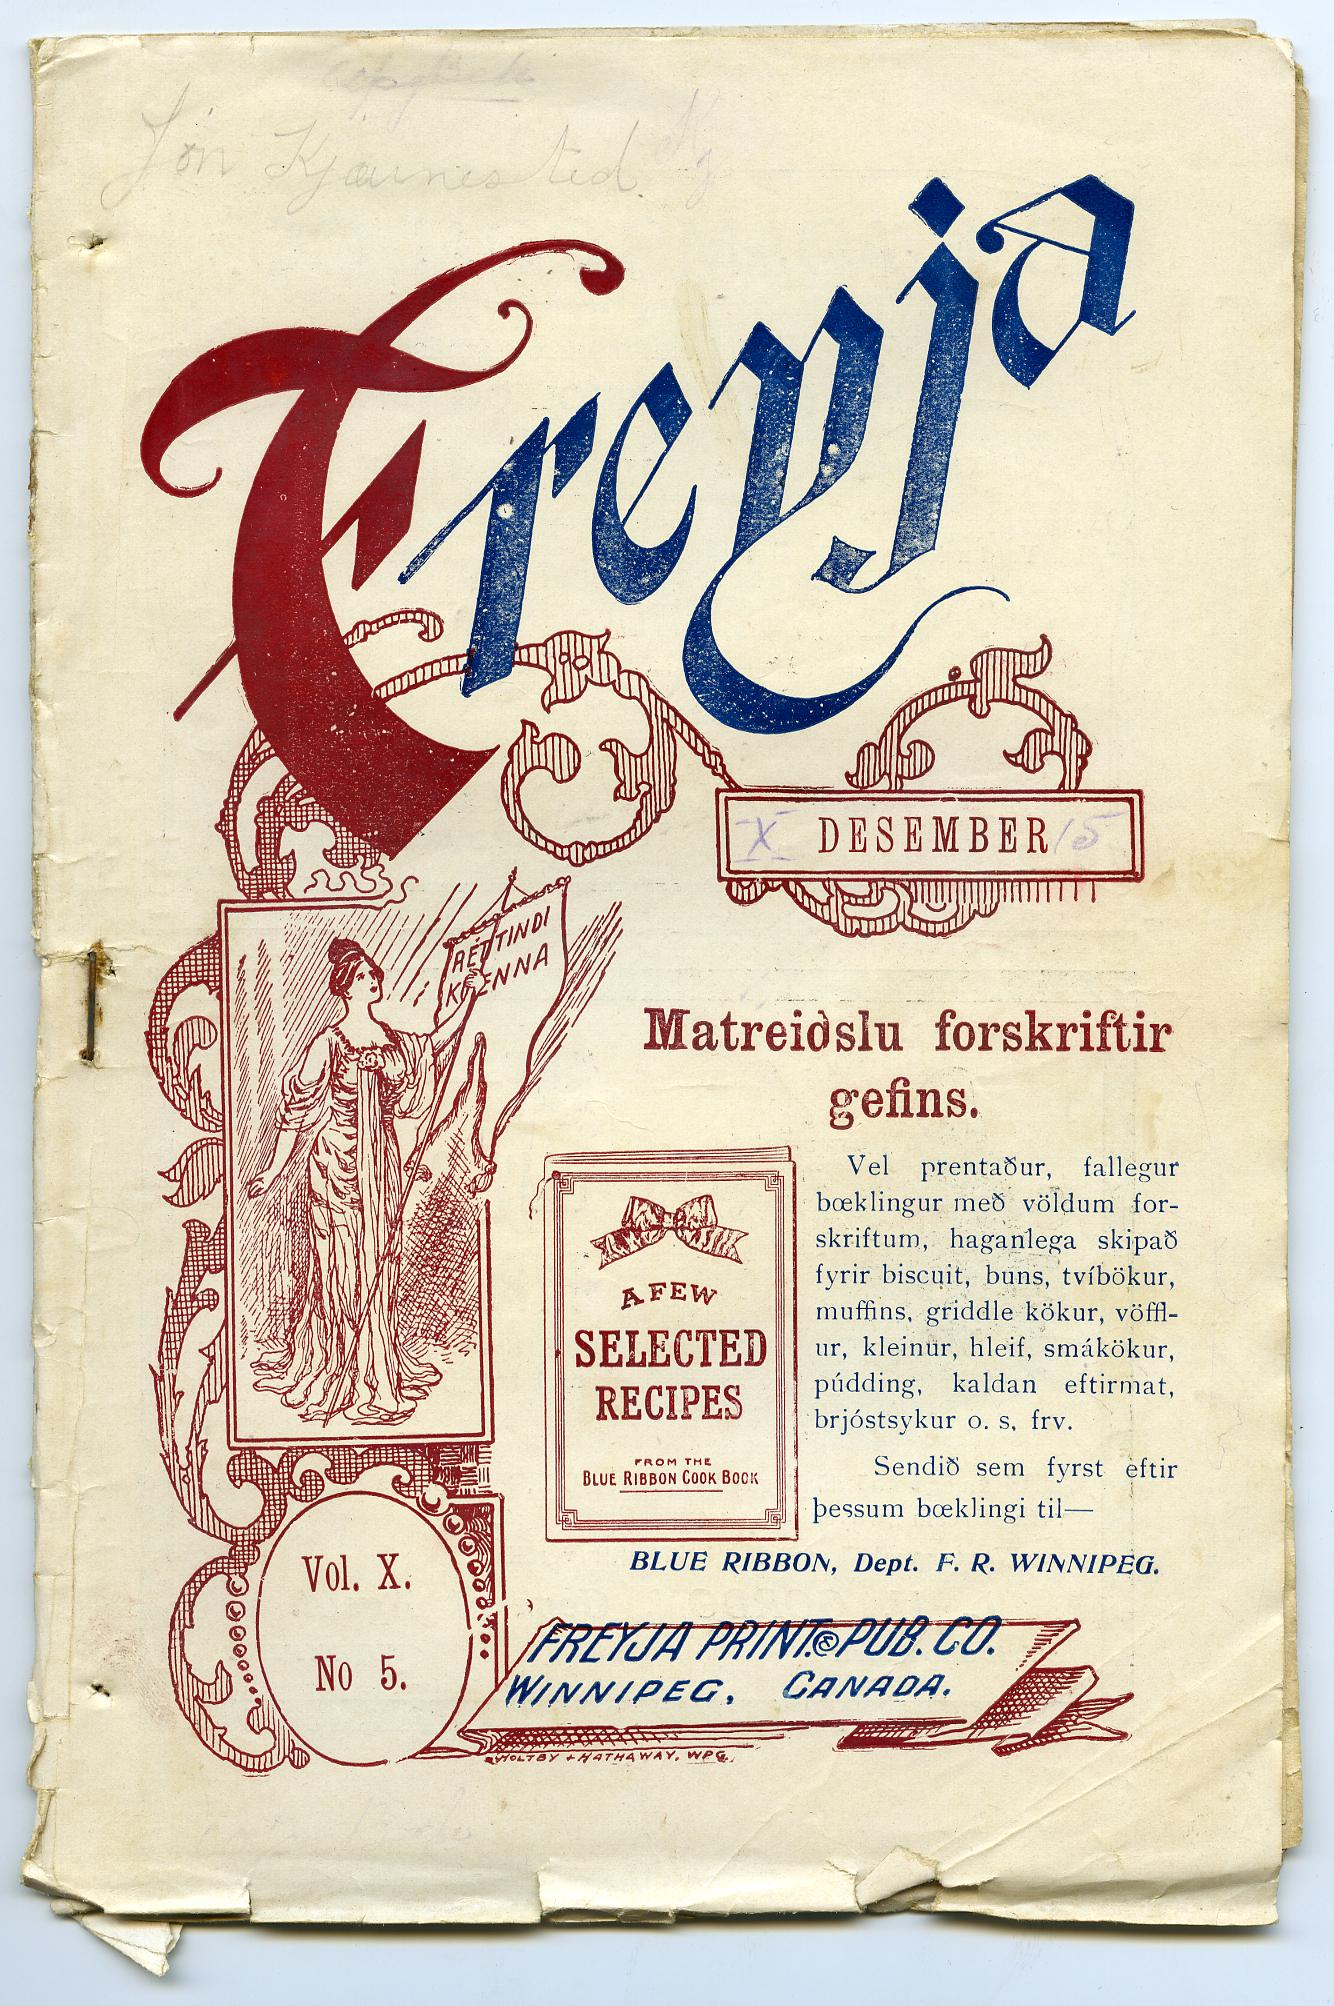 January 1907 Issue of Freyja, Suffragist Monthly Magazine